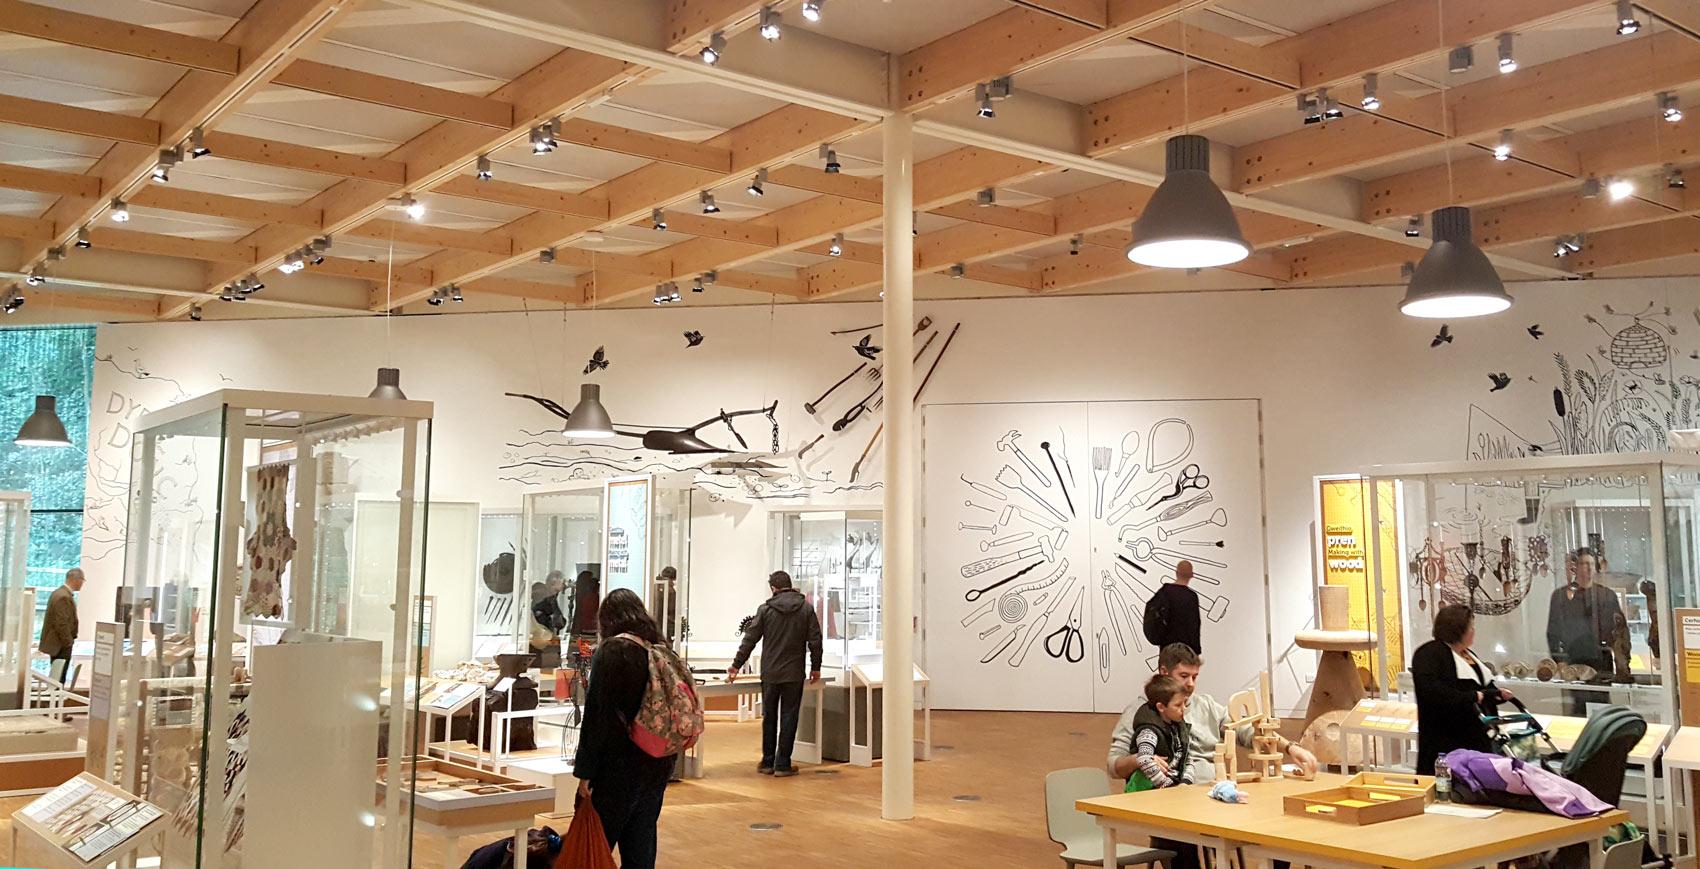 Sarah-Edmonds-Gweithdy-gallery